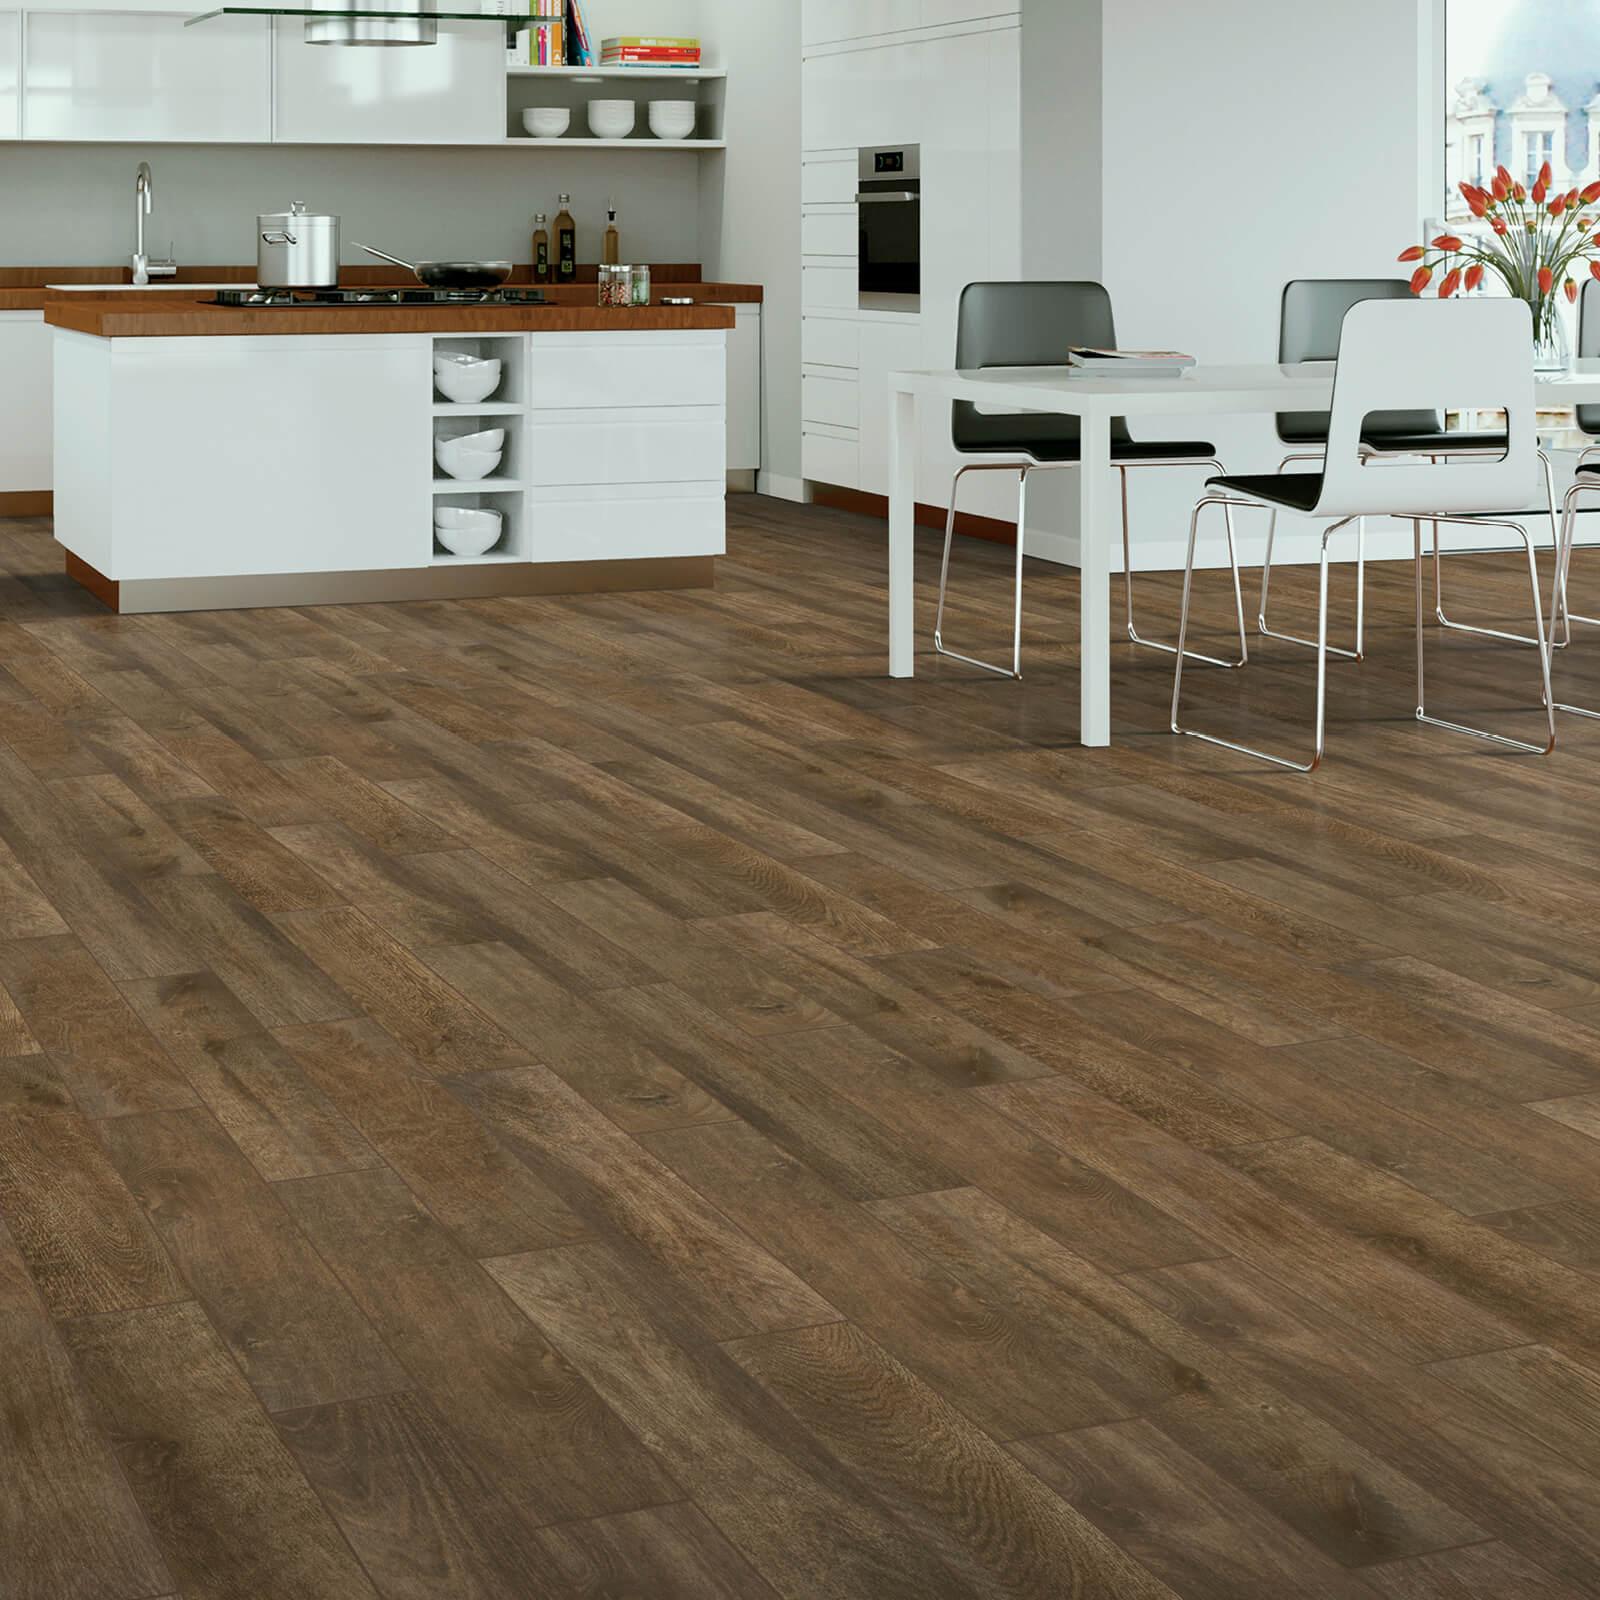 Madison Creek Sunset Natural flooring | Dolphin Carpet & Tile